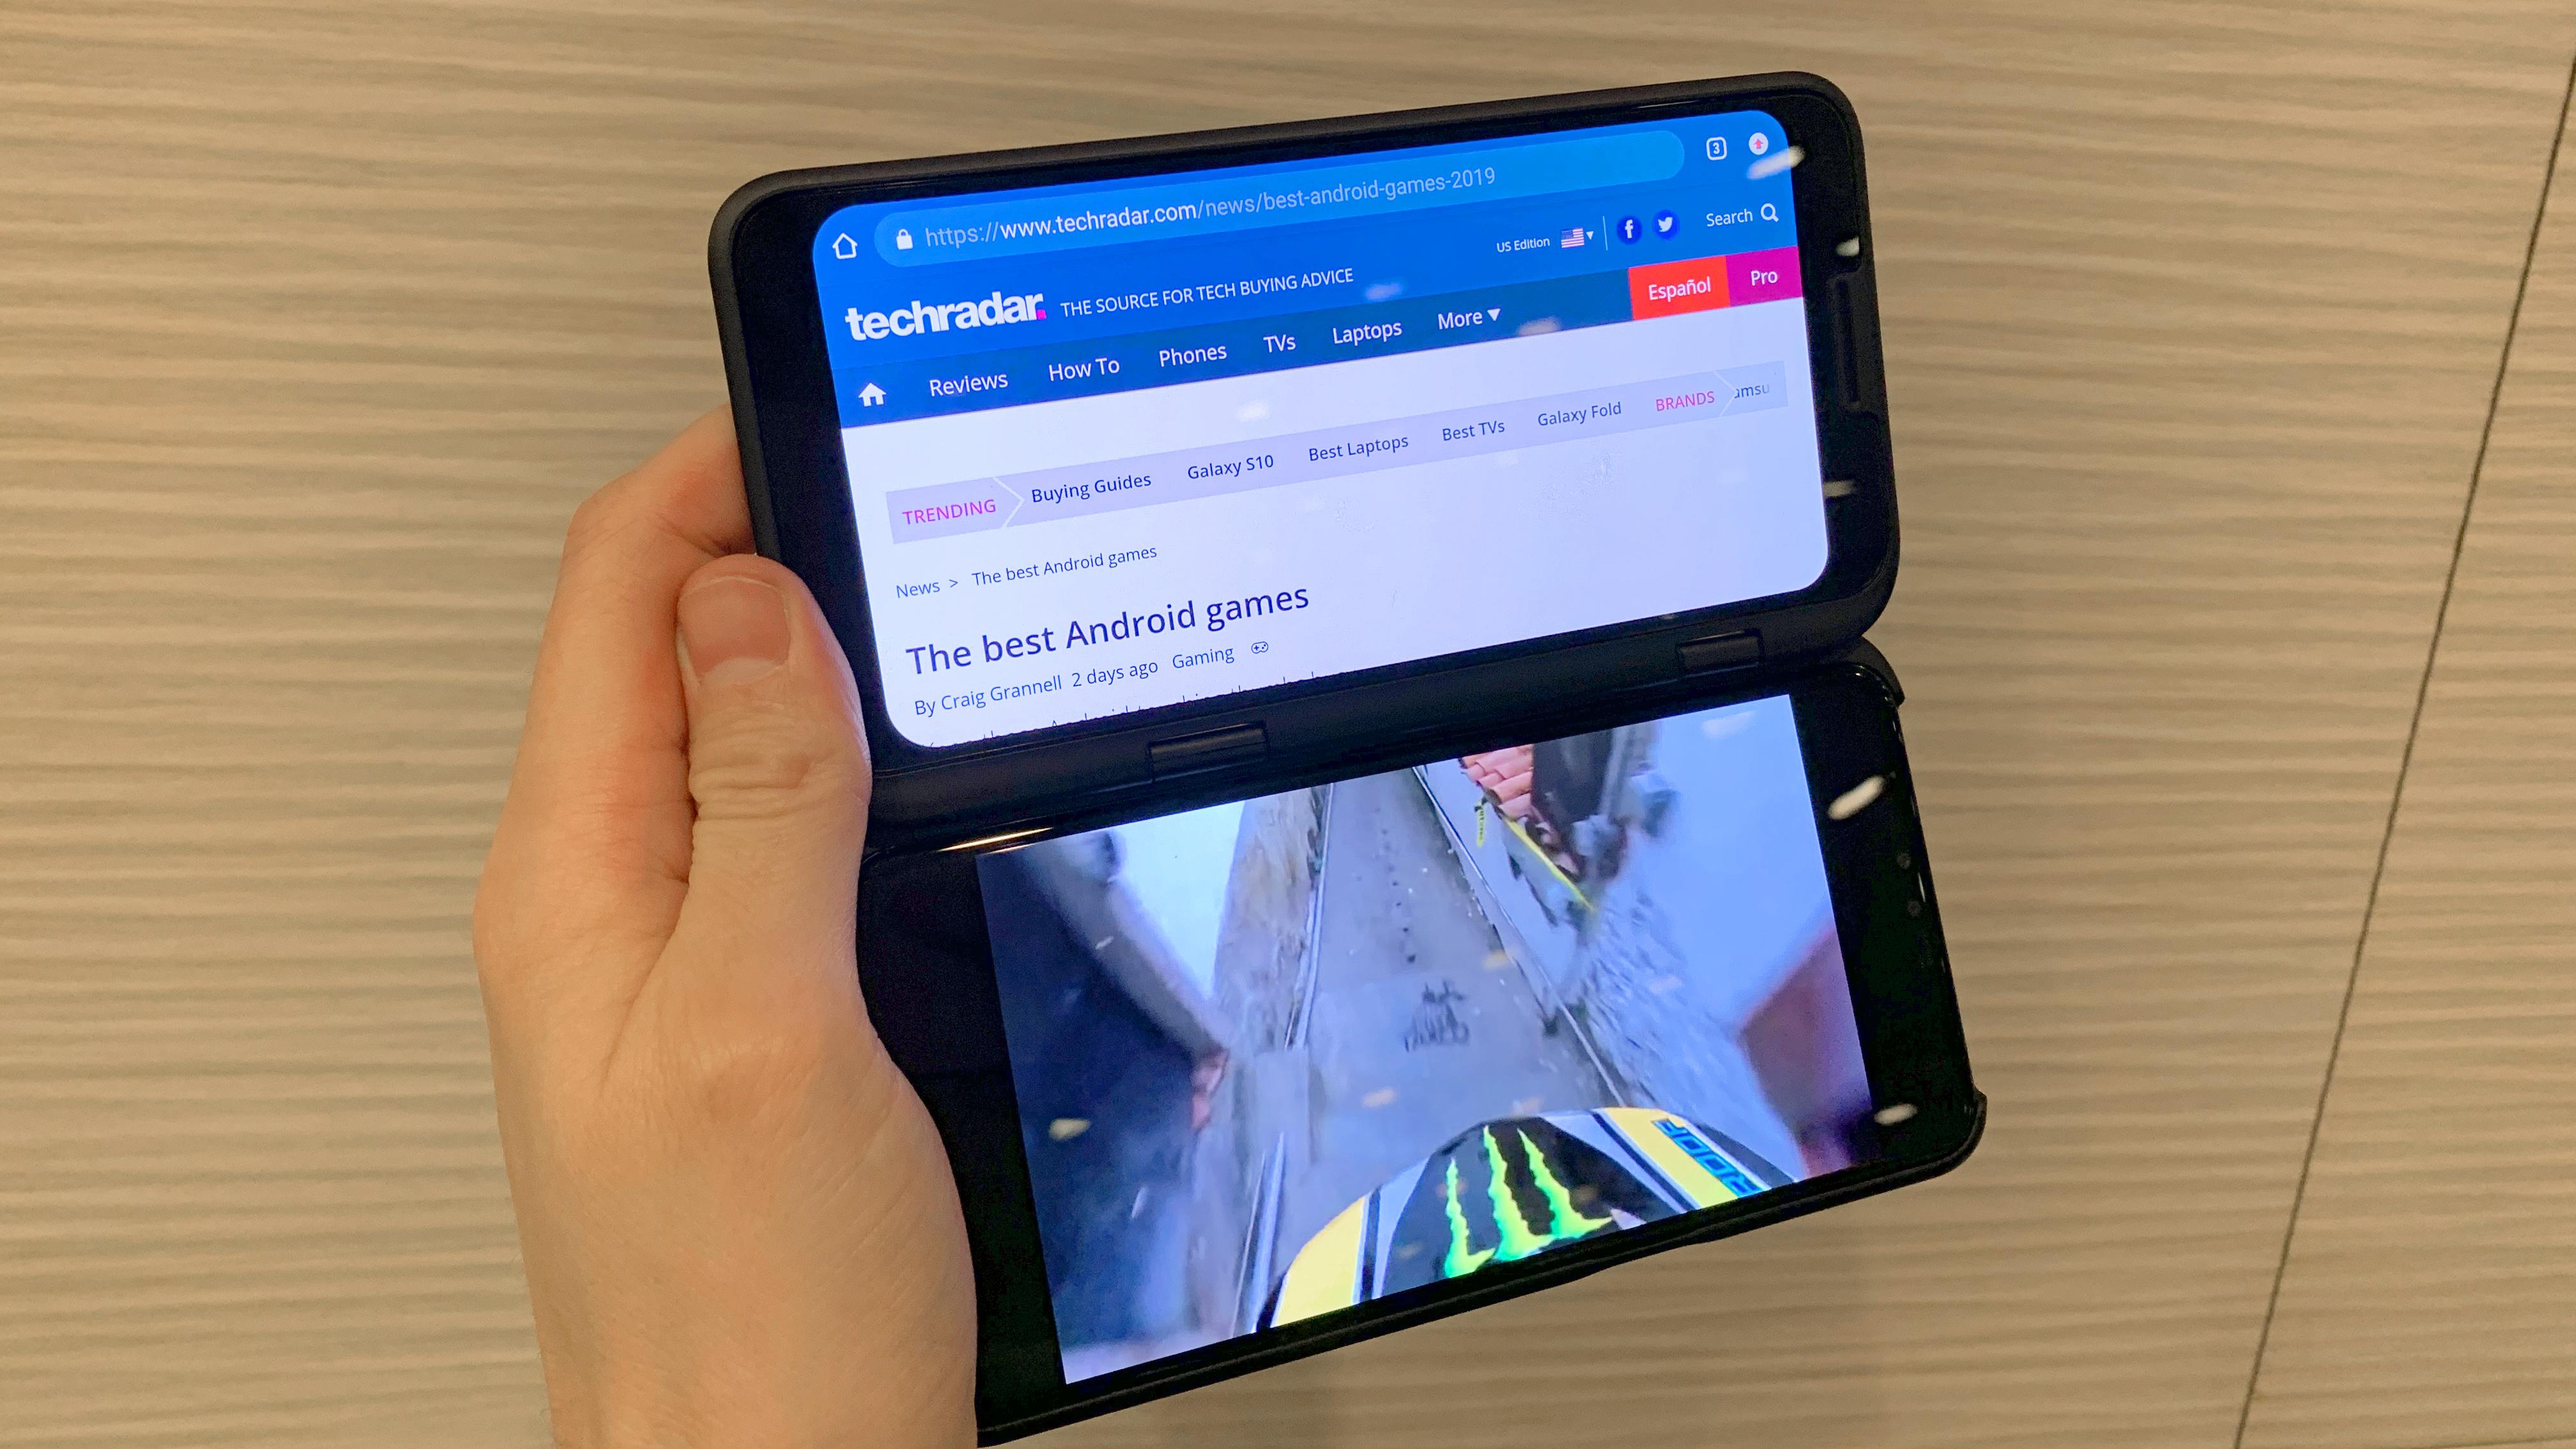 LG DualScreen: first look at LG